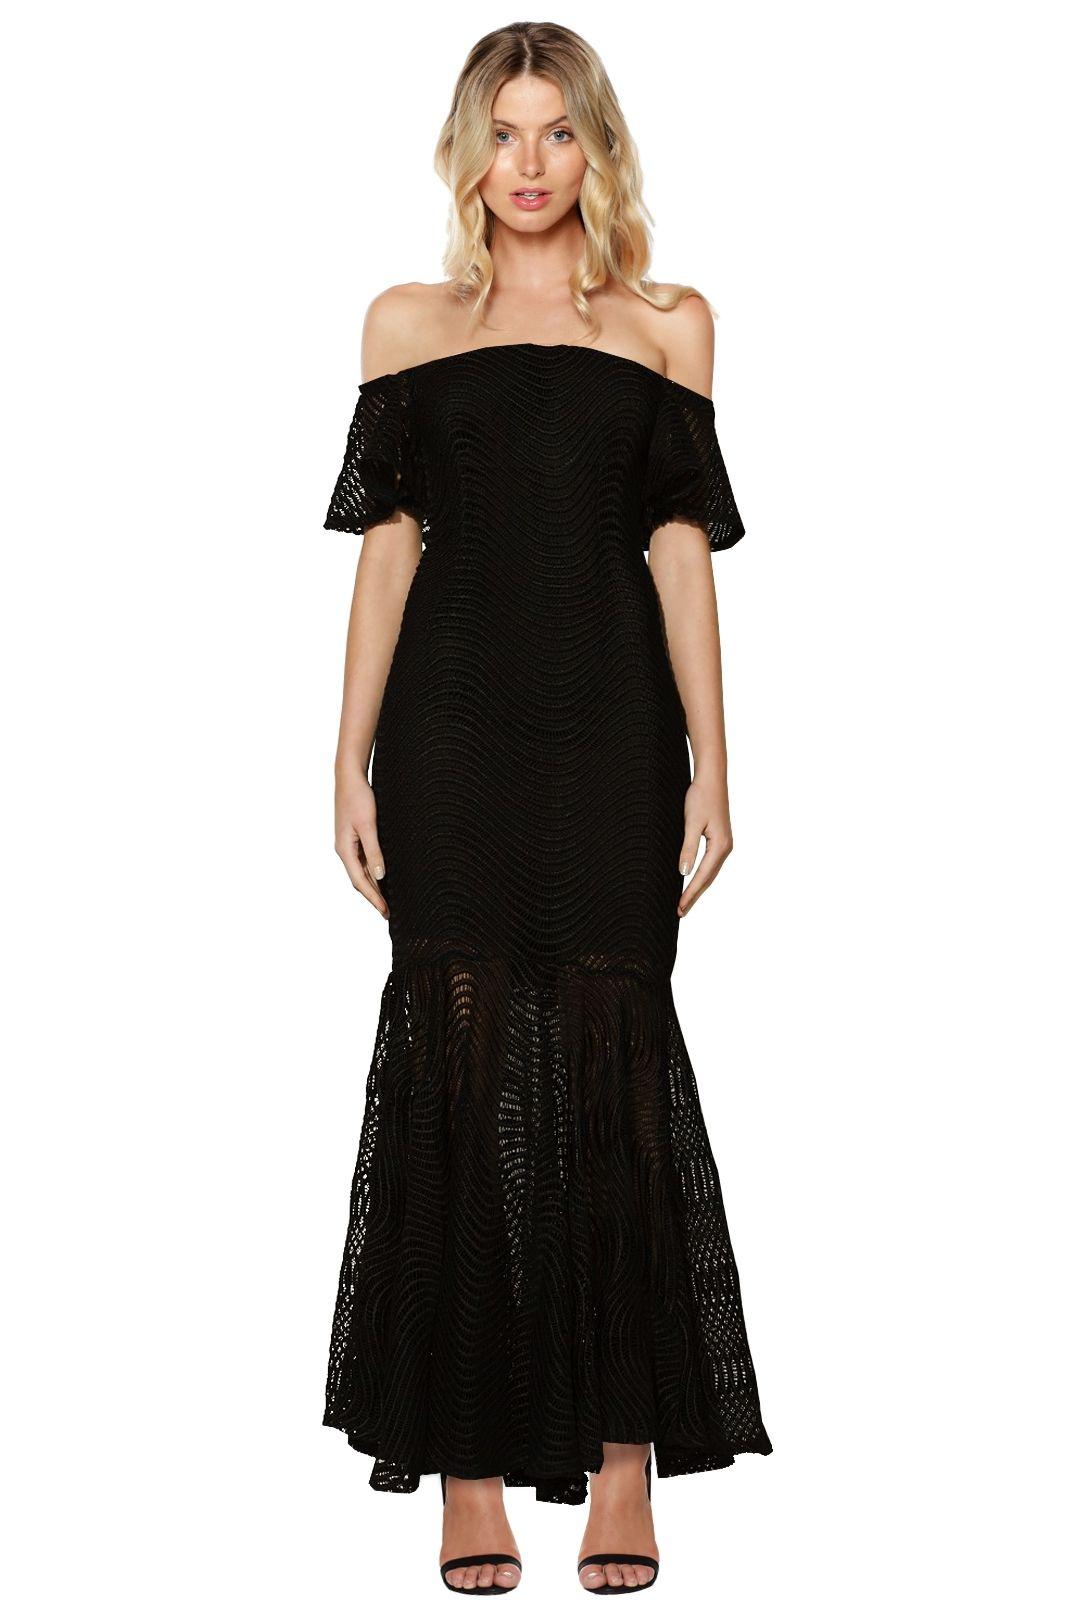 Mossman - Spinning the Web Dress - Black - Front